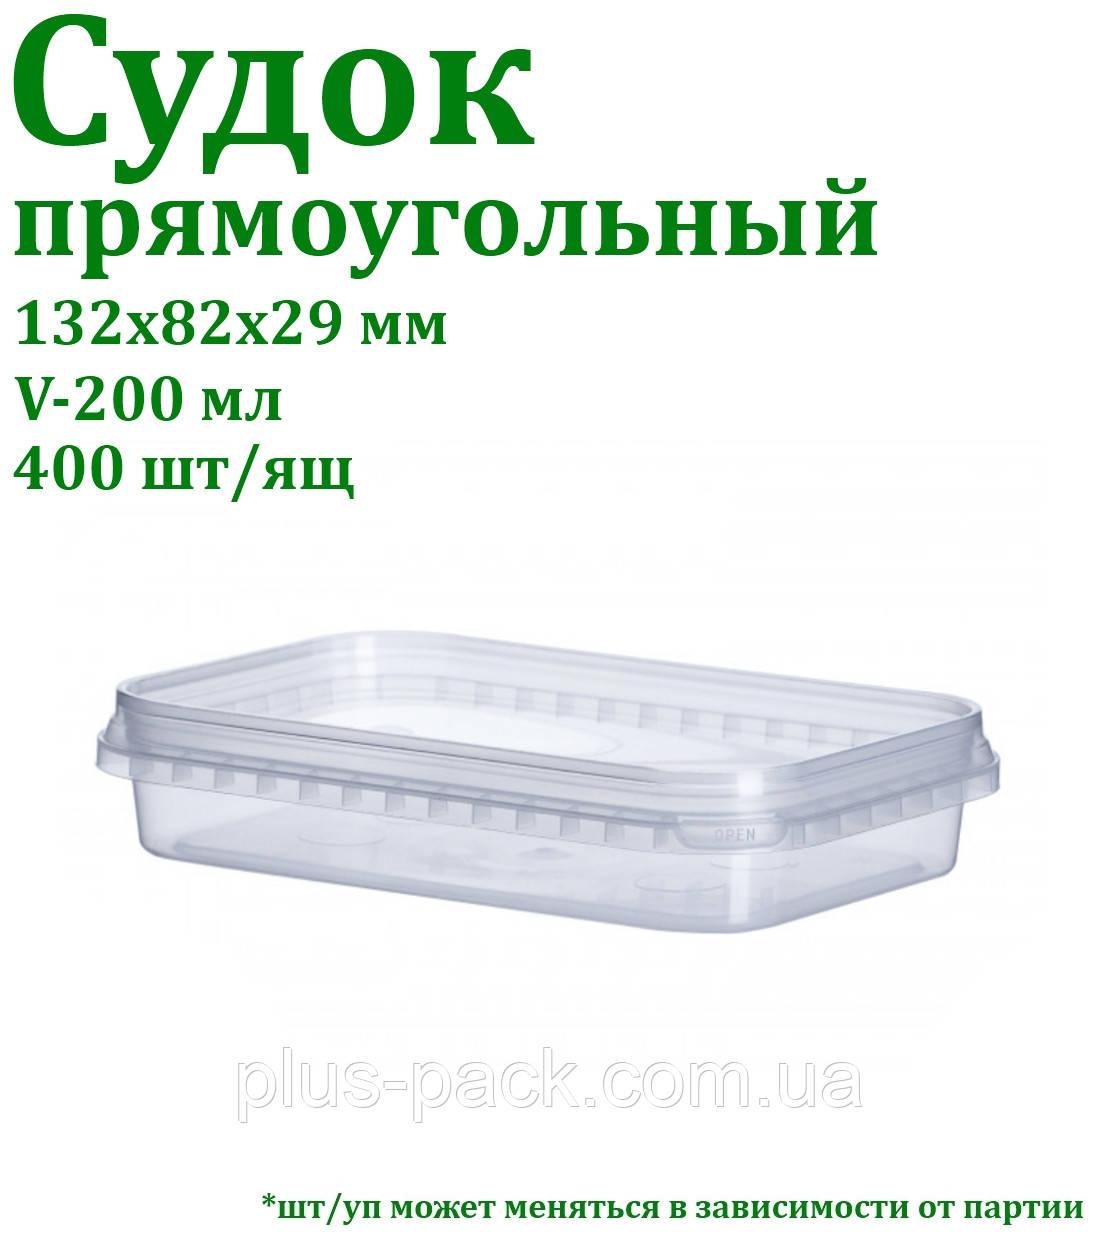 Судок прямоугольный 200мл VitalPlast 132х29